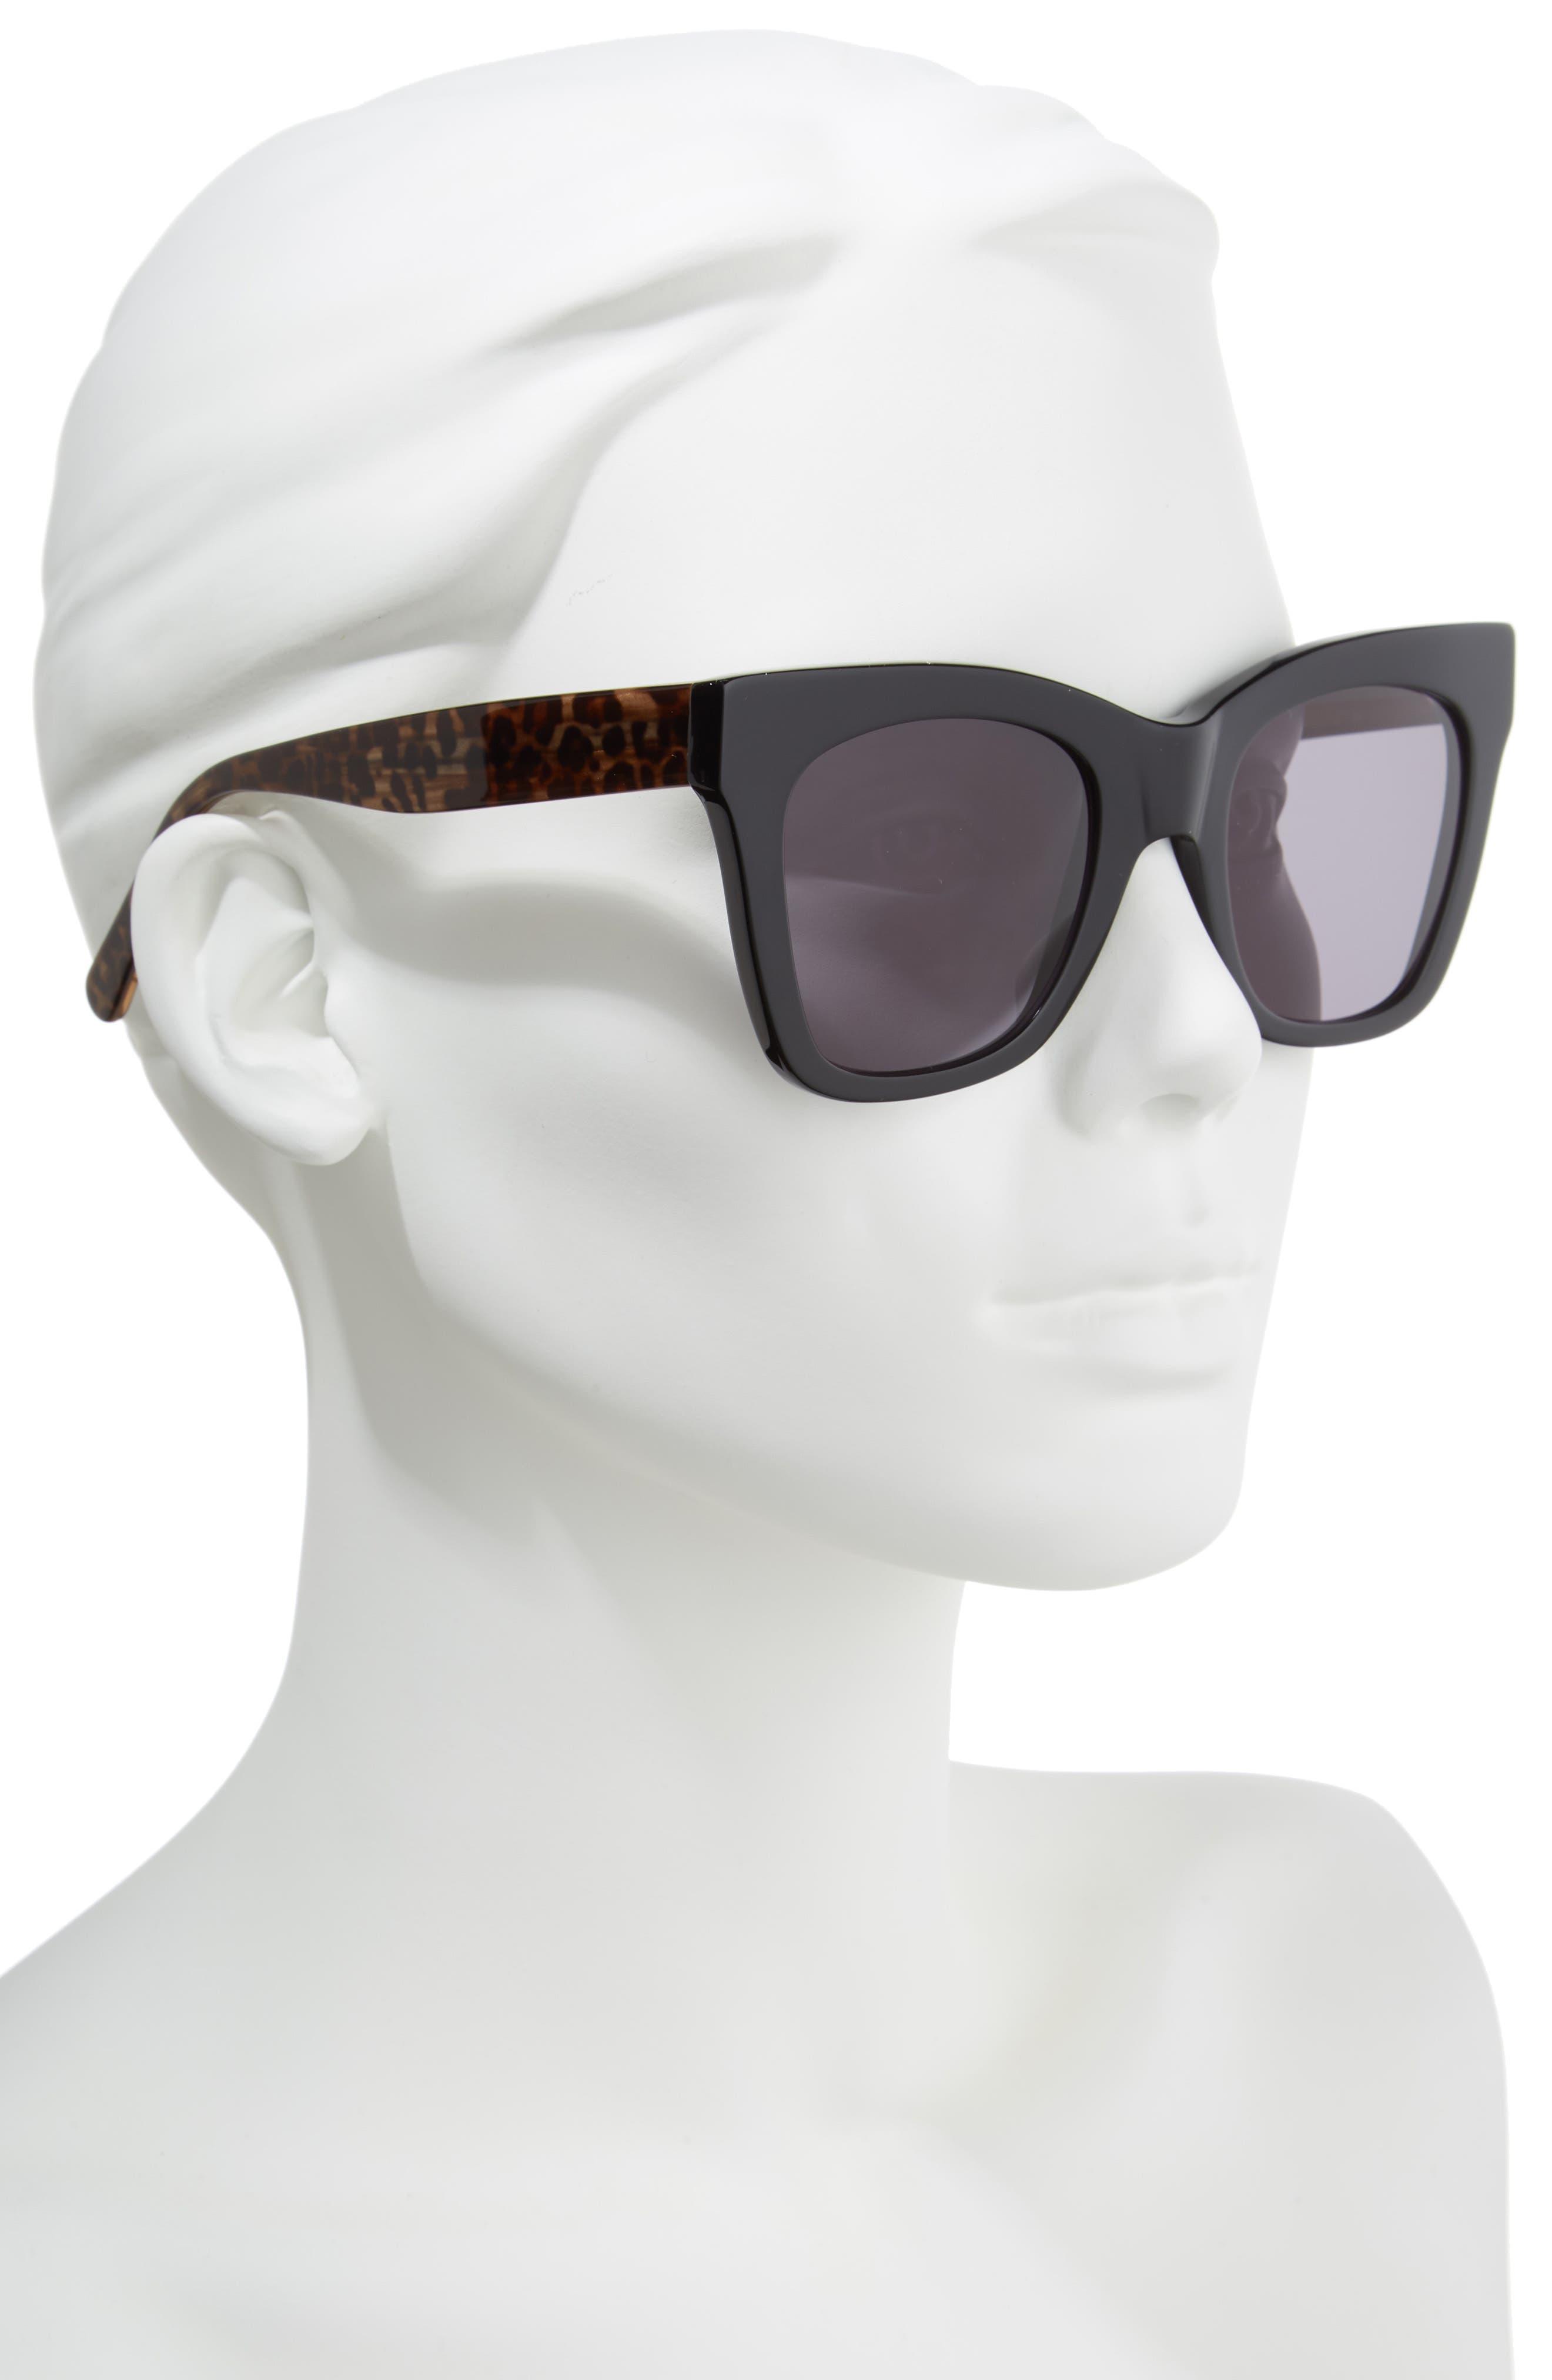 D'BLANC Beach Vida 52mm Sunglasses,                             Alternate thumbnail 2, color,                             BLACK CHEETAH/ GREY